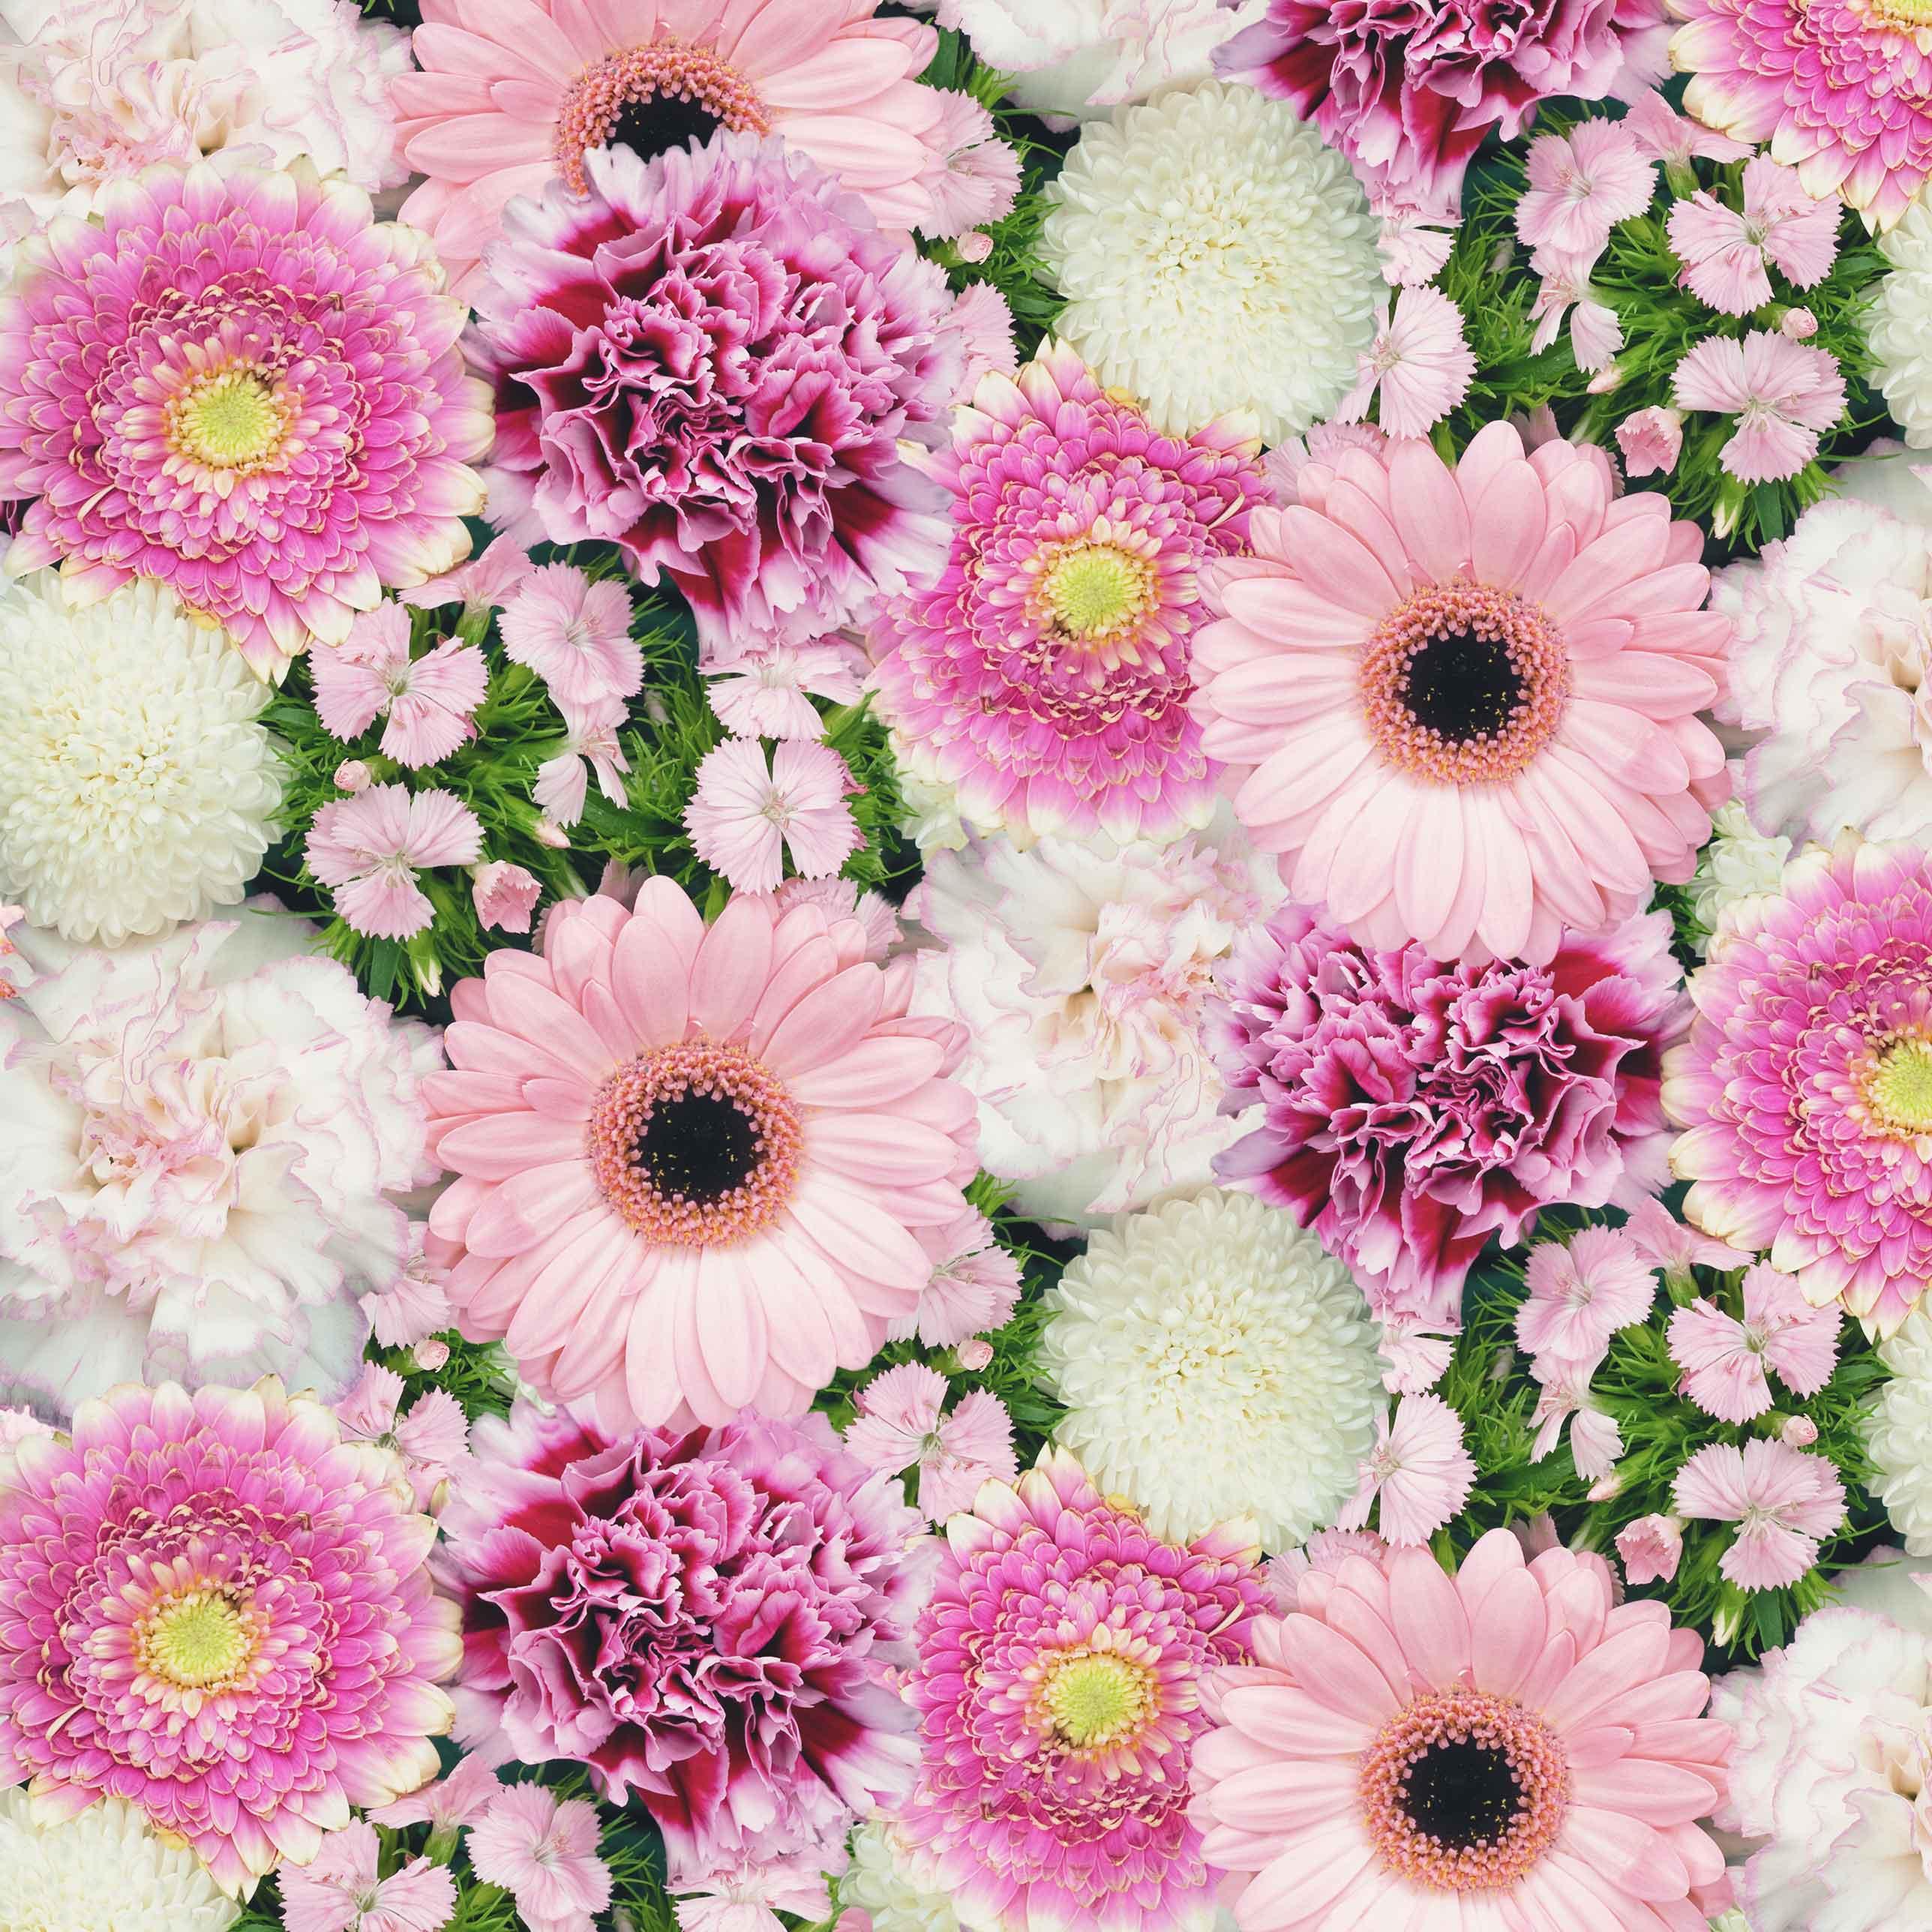 Plakfolie Flowers 6225 - 45cm x 15m